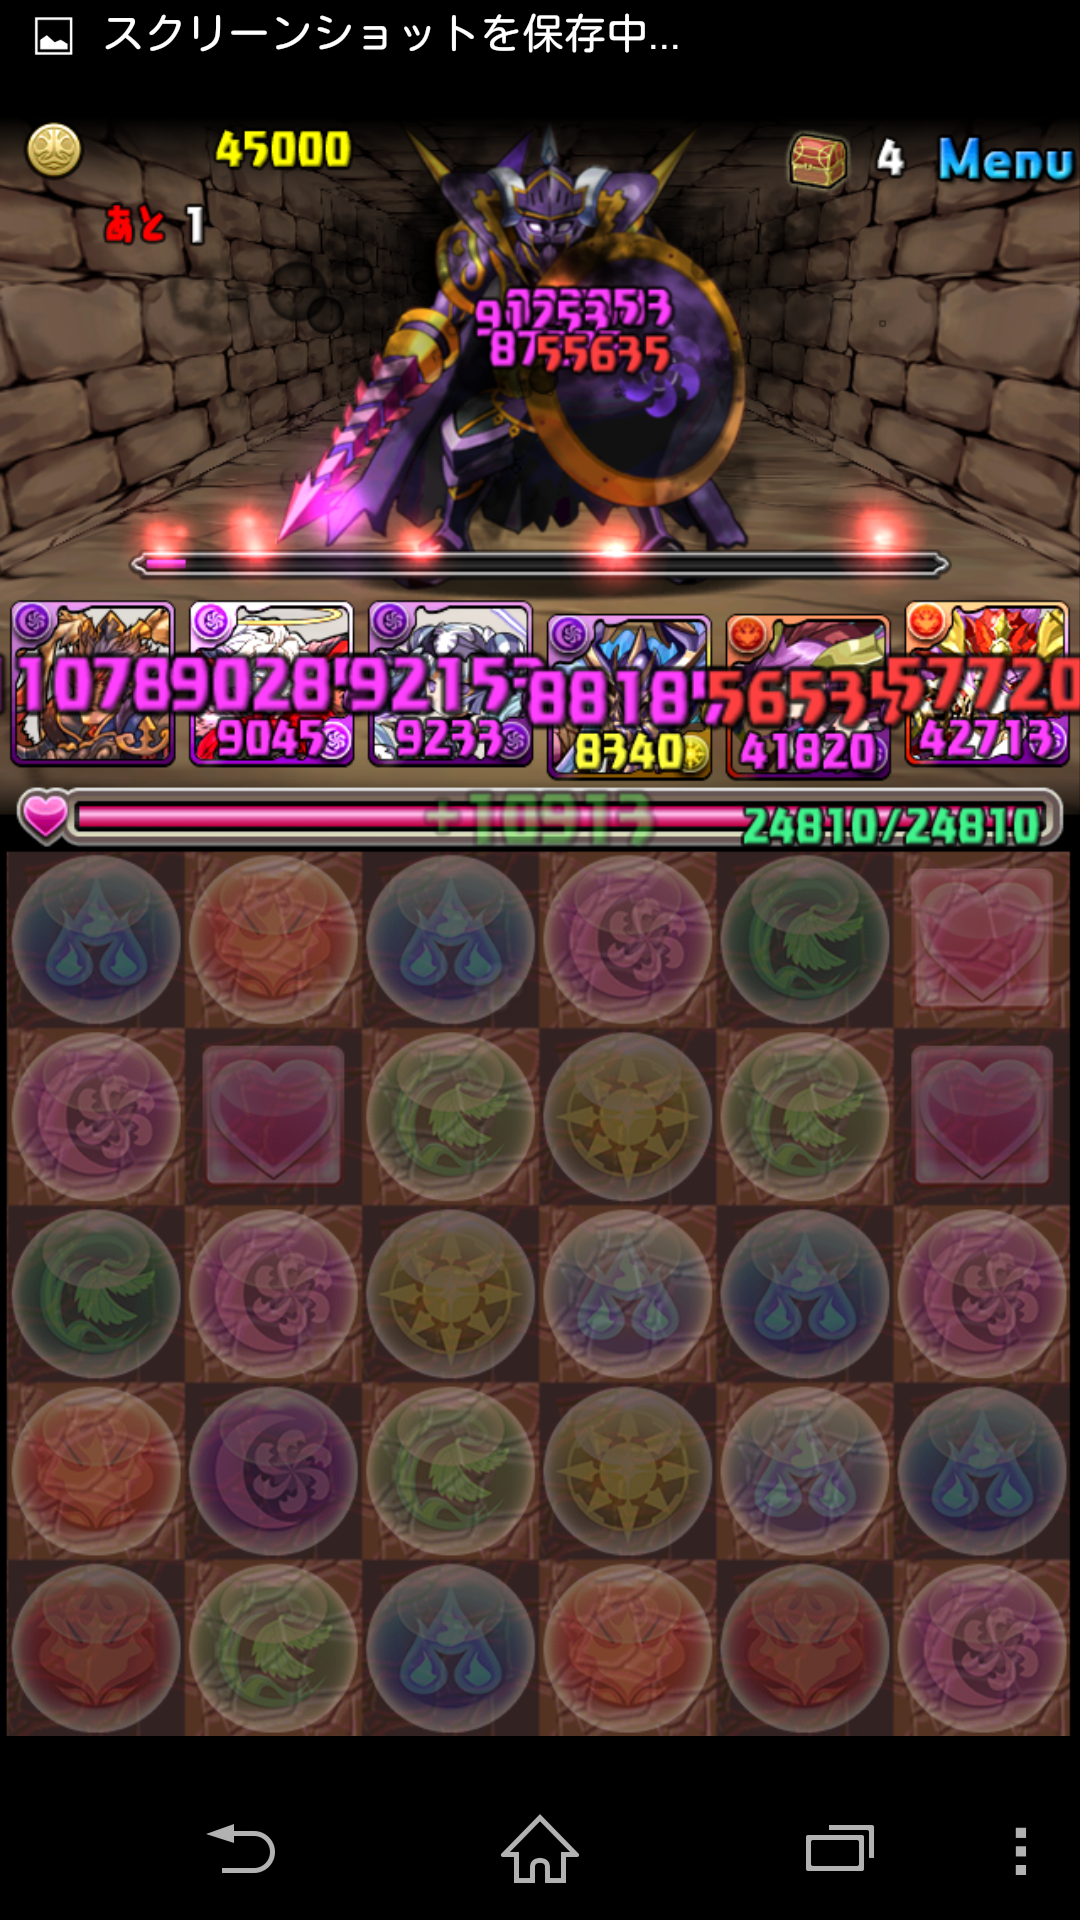 Screenshot_2014-10-22-00-03-58.png